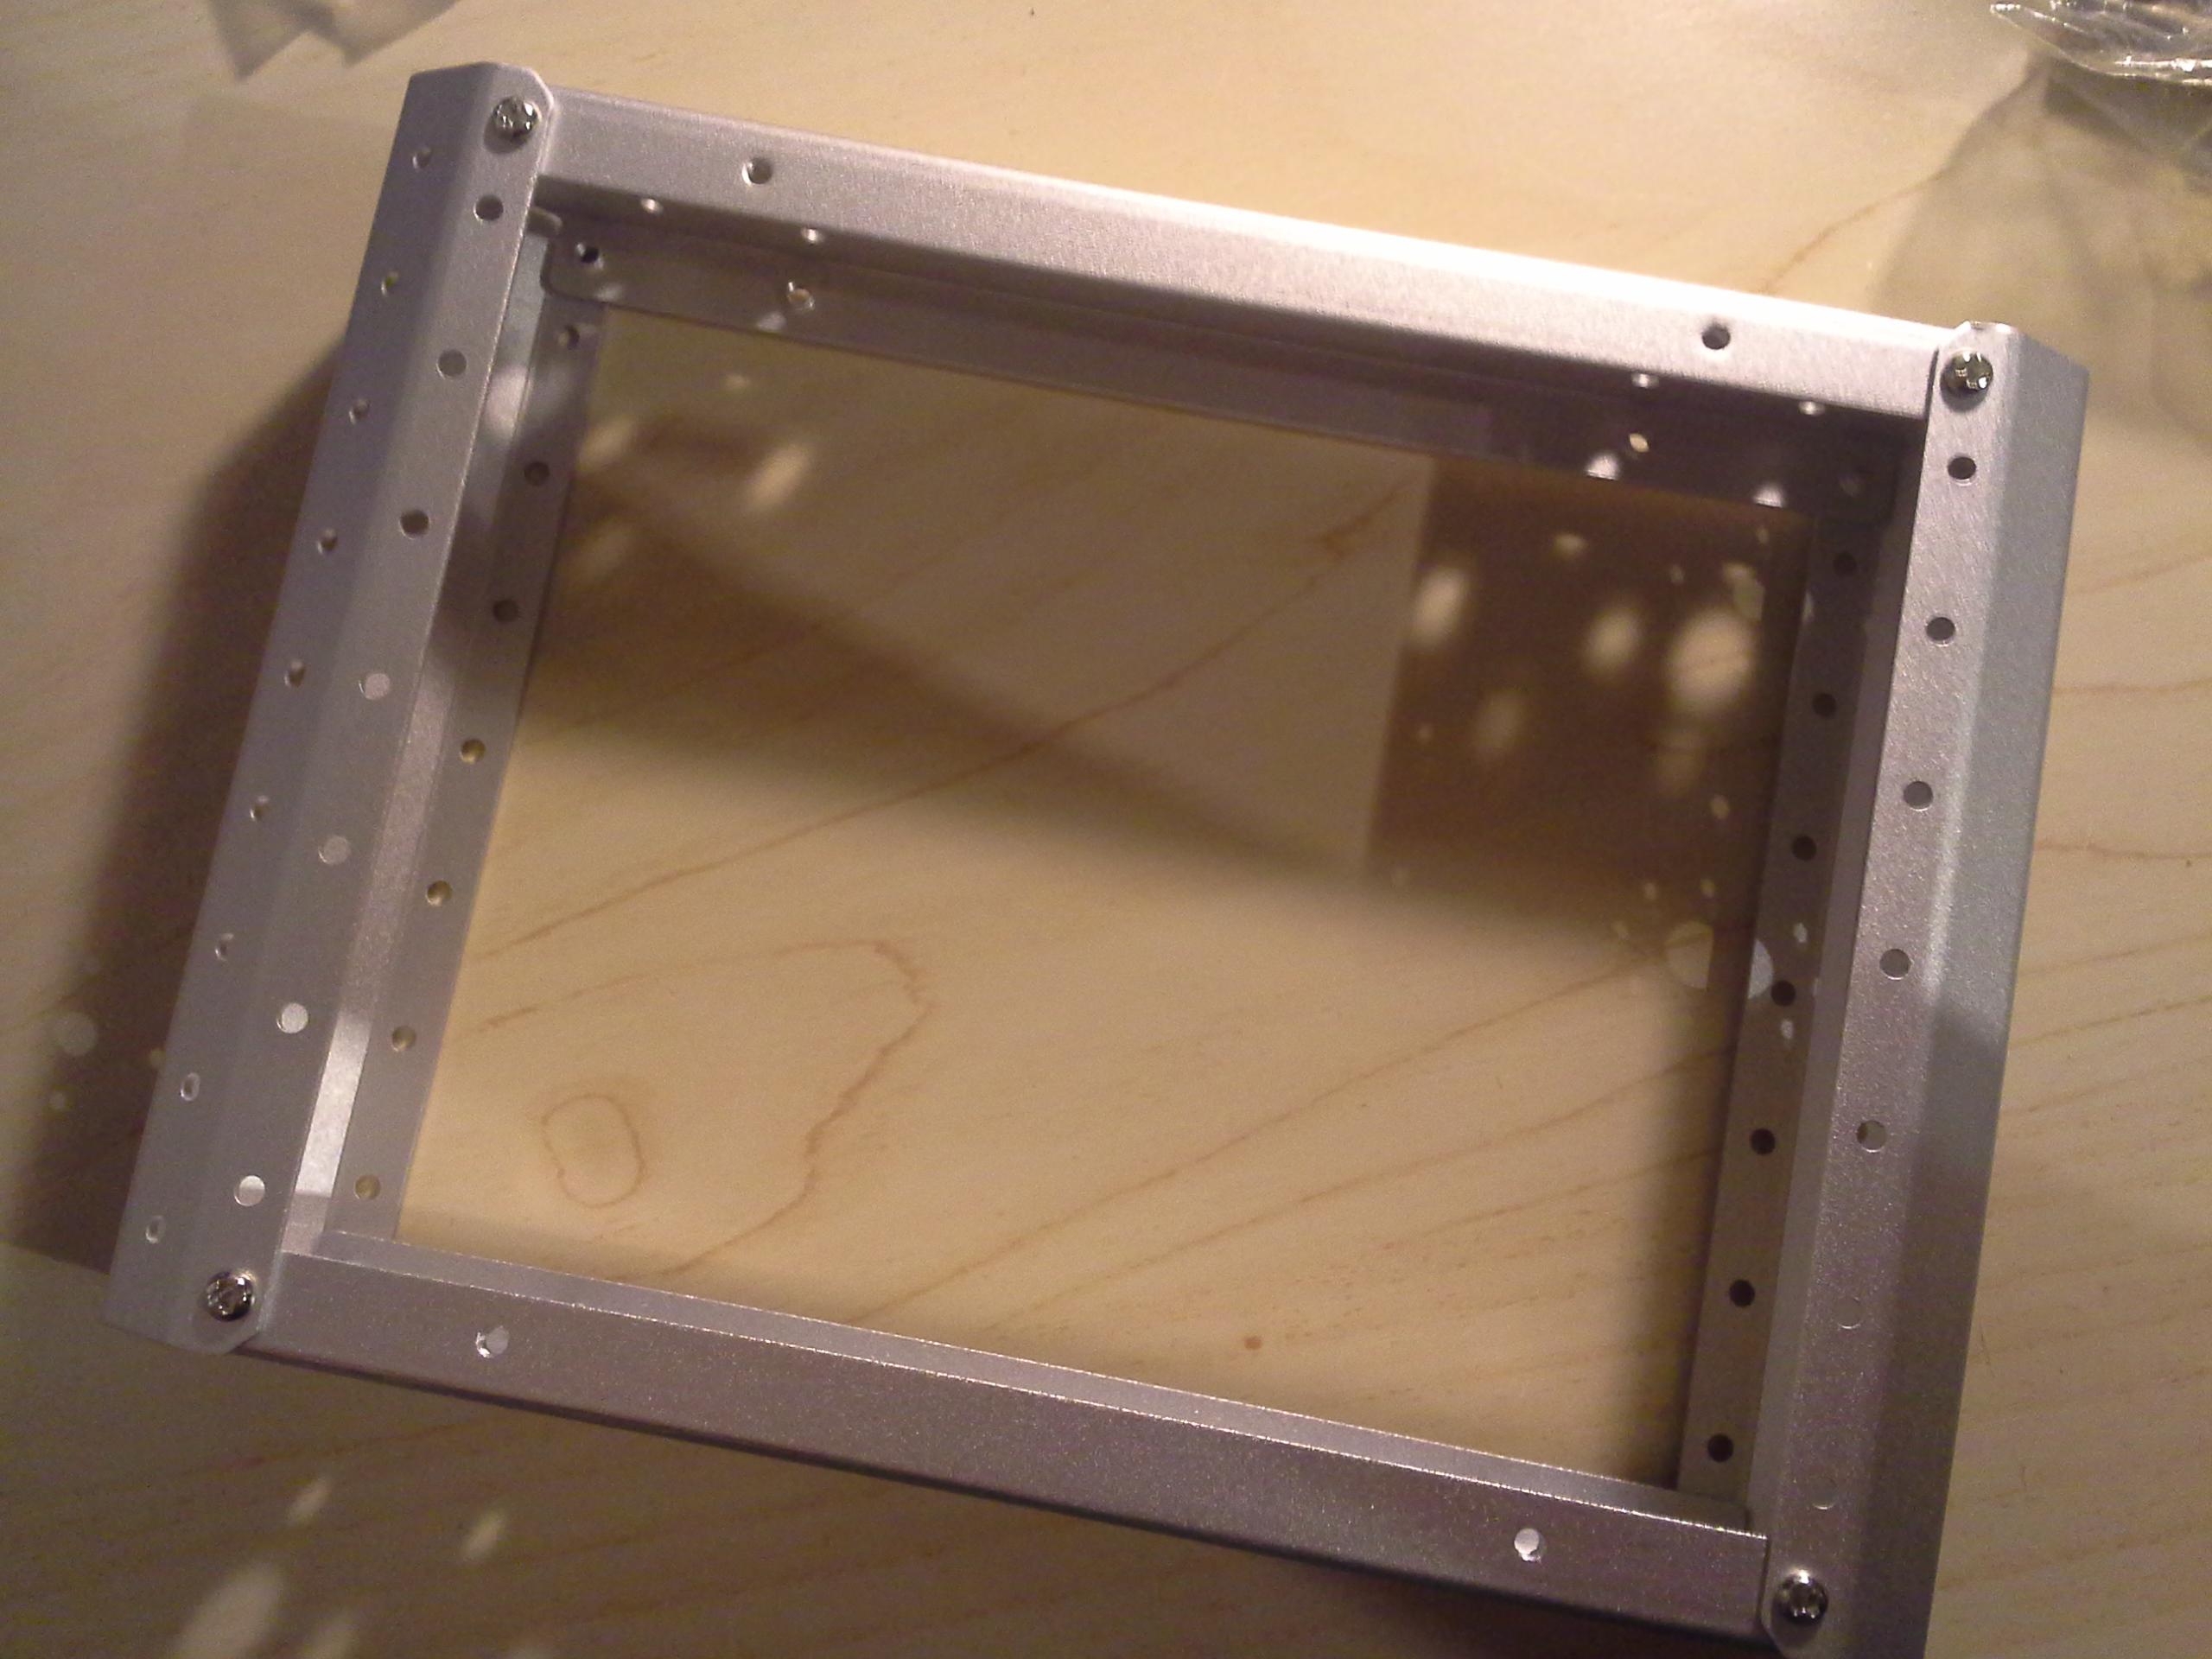 4WD Aluminium Mobile Robot Platform Bild 04: Rahmen verschrauben